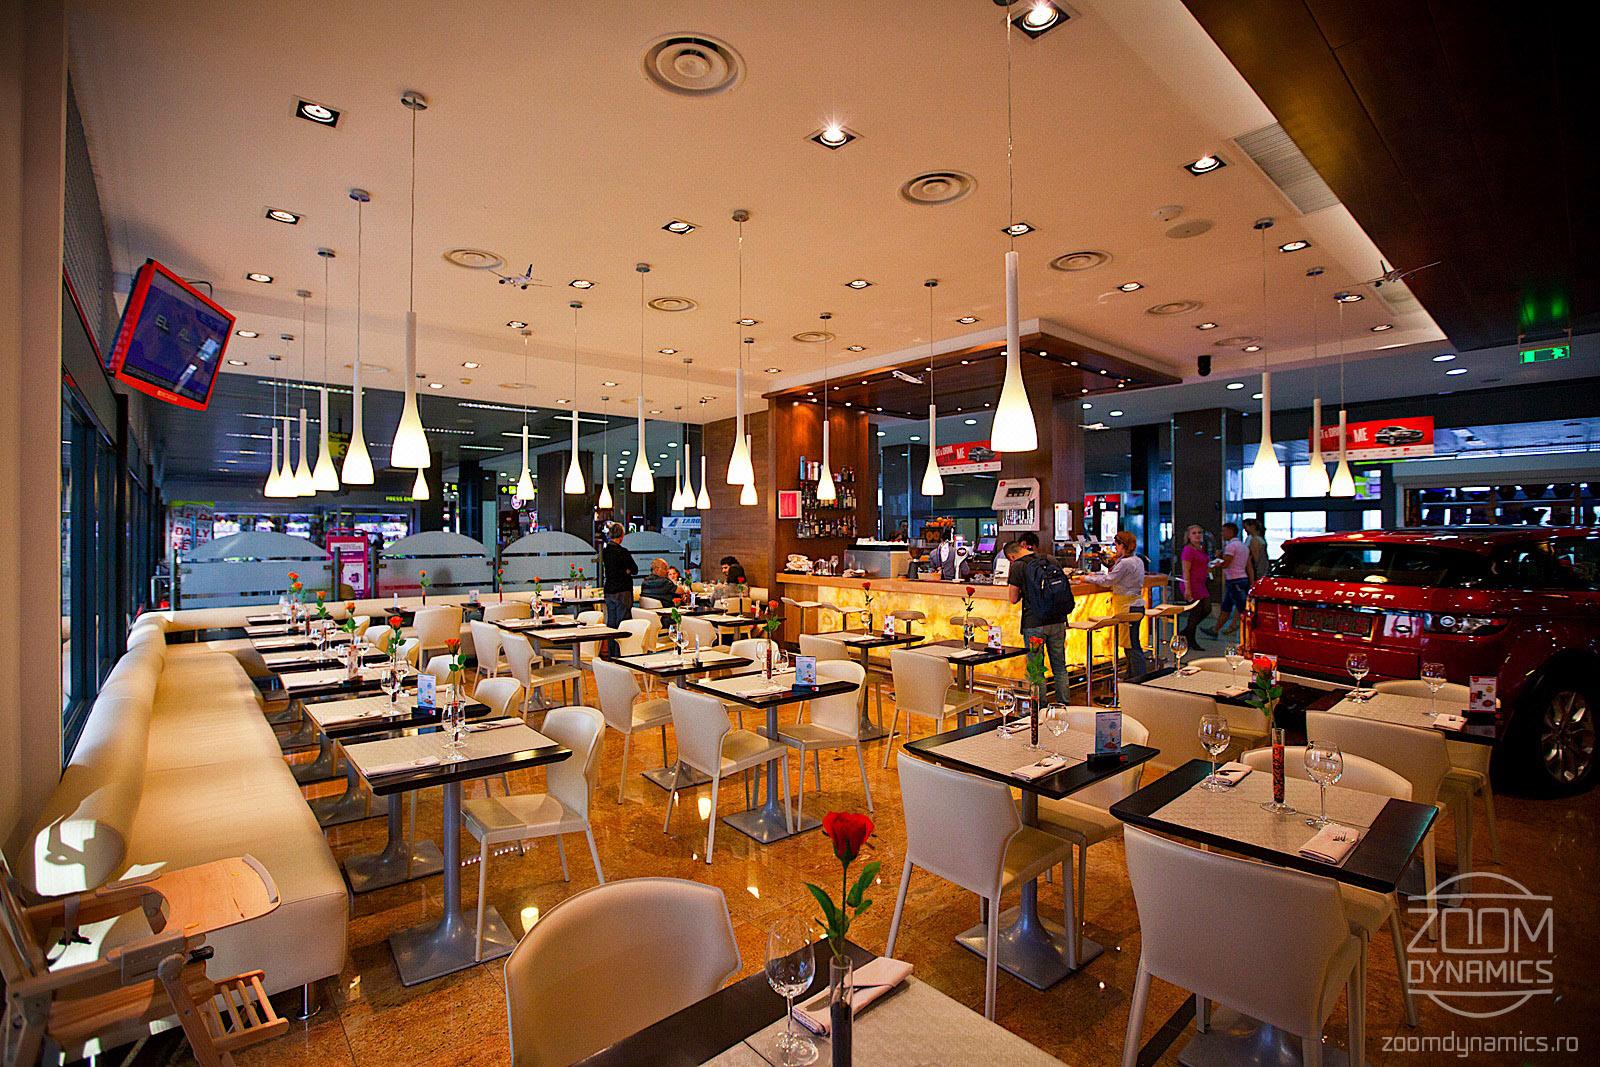 Refuel - Live Cooking - Henri Coanda International Airport